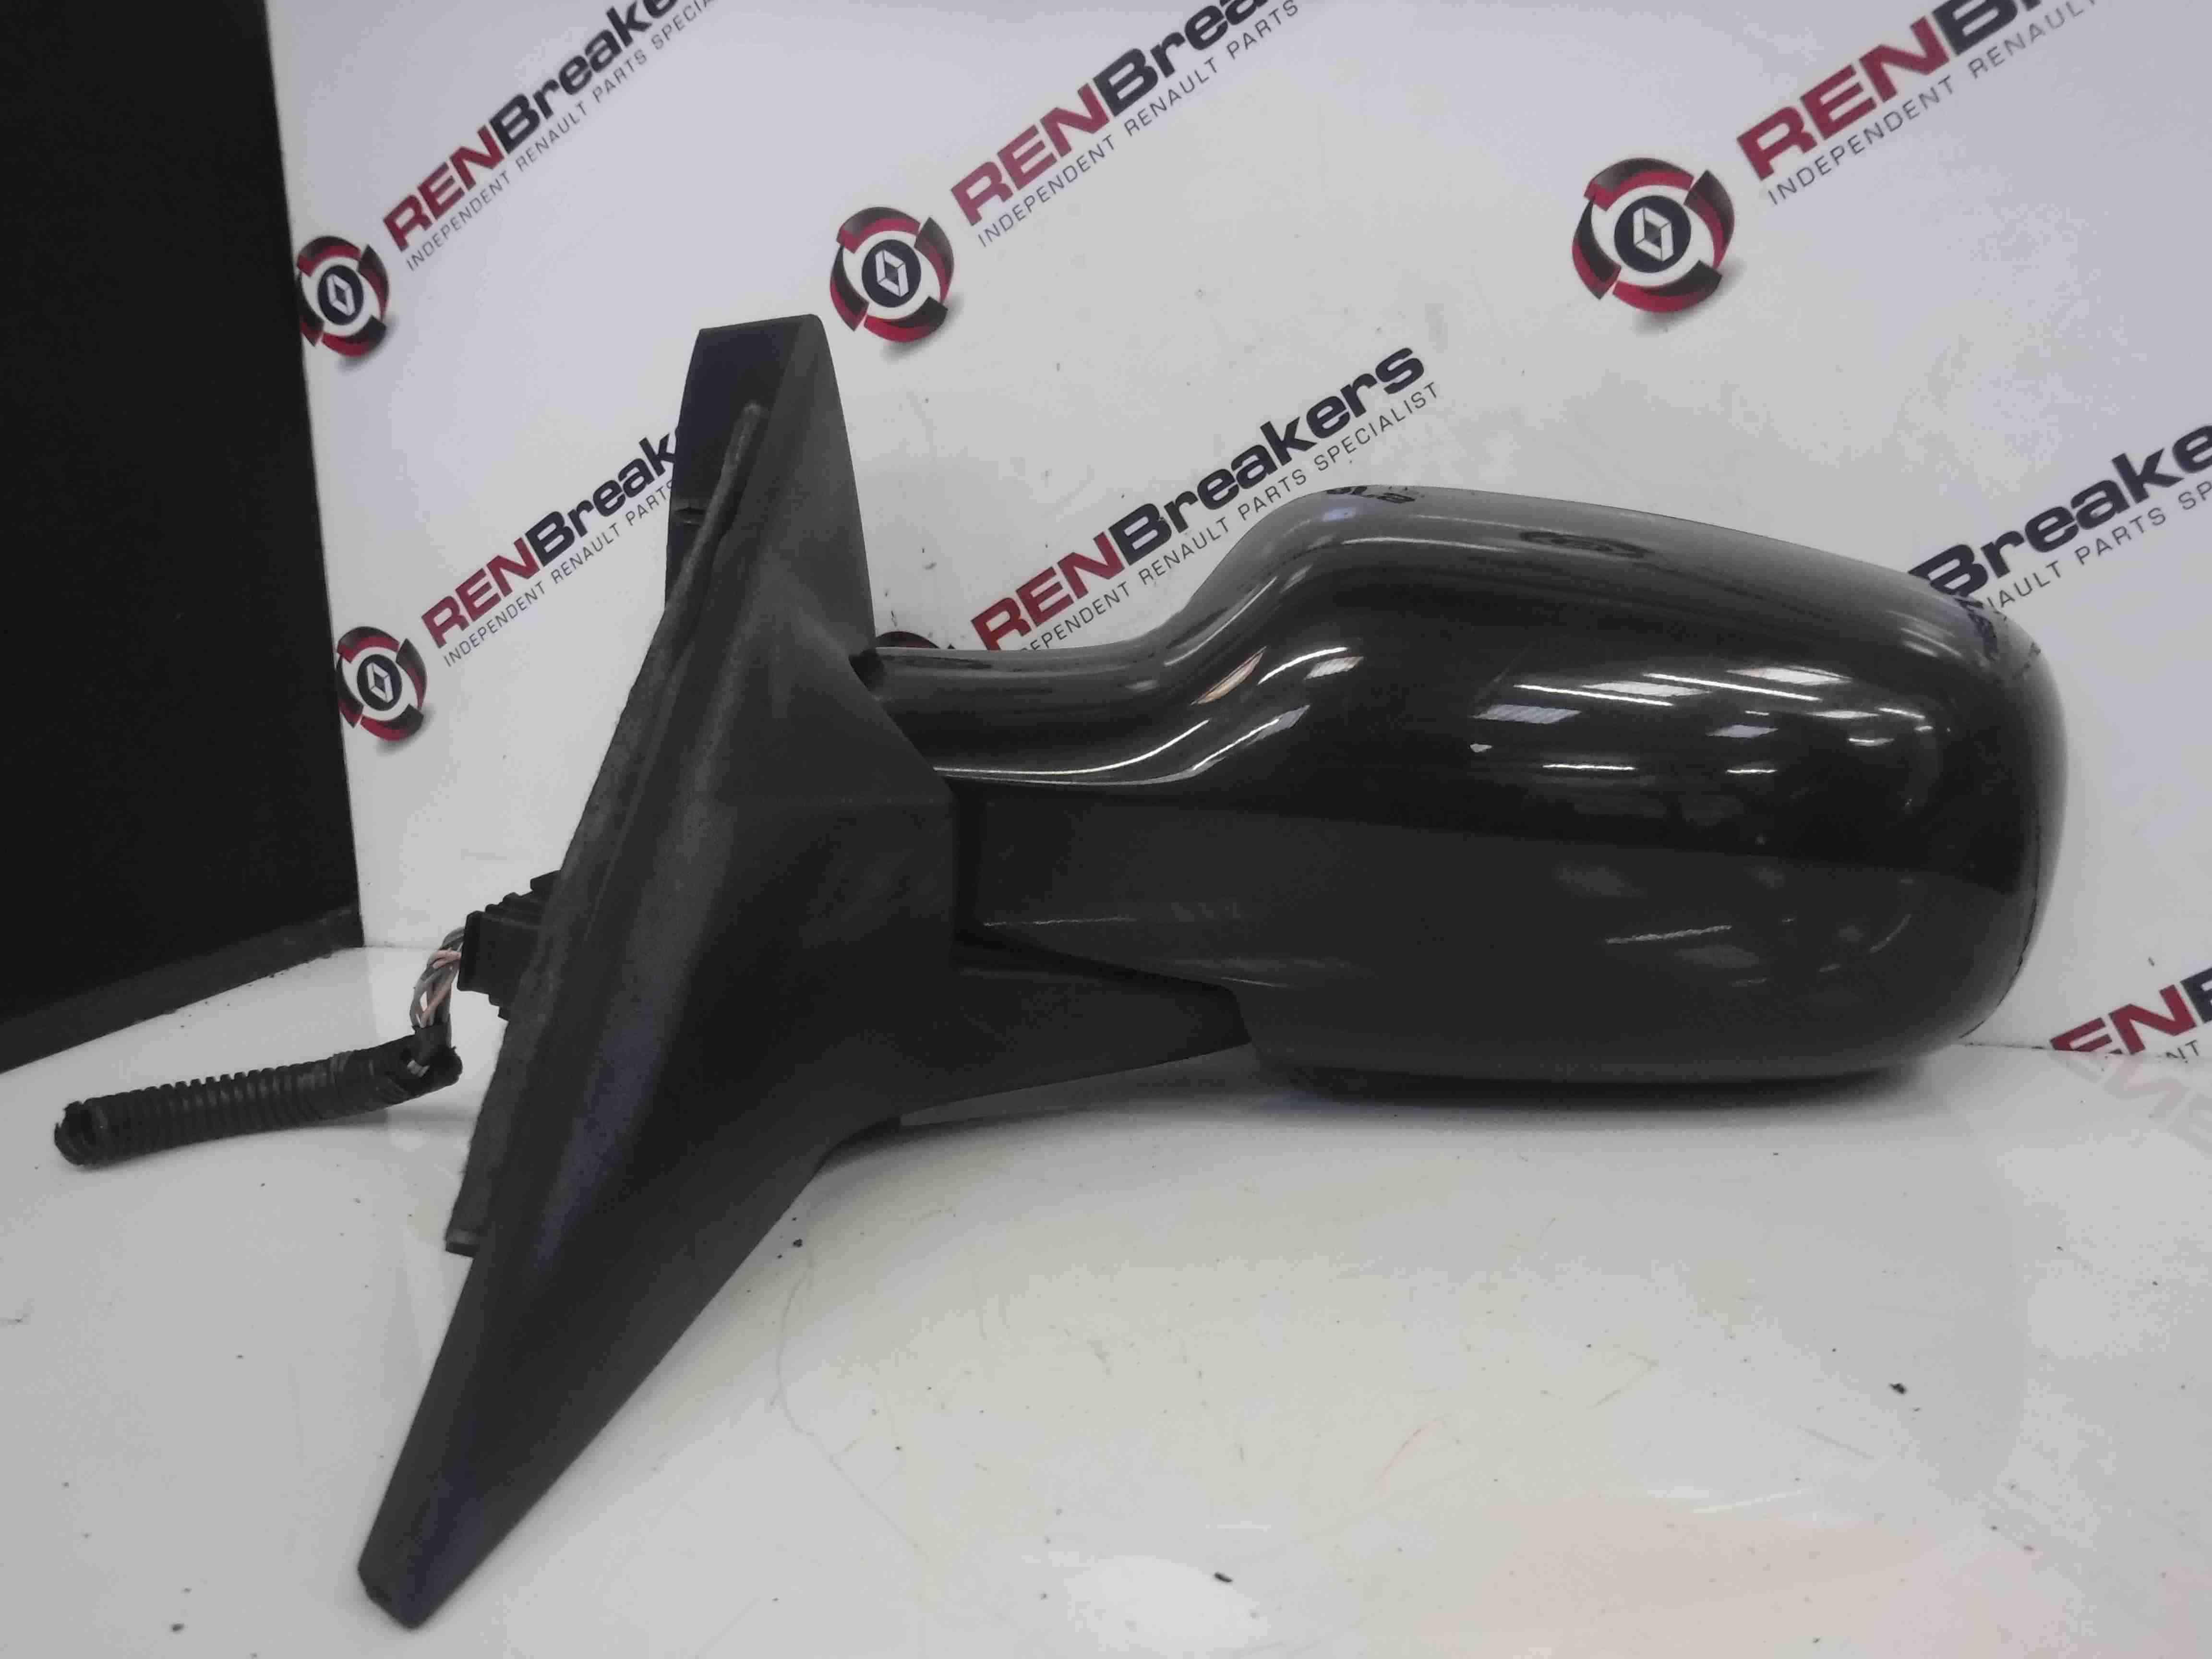 Renault Megane Scenic 2003-2009 Passenger NSF Front Wing Mirror Black 676